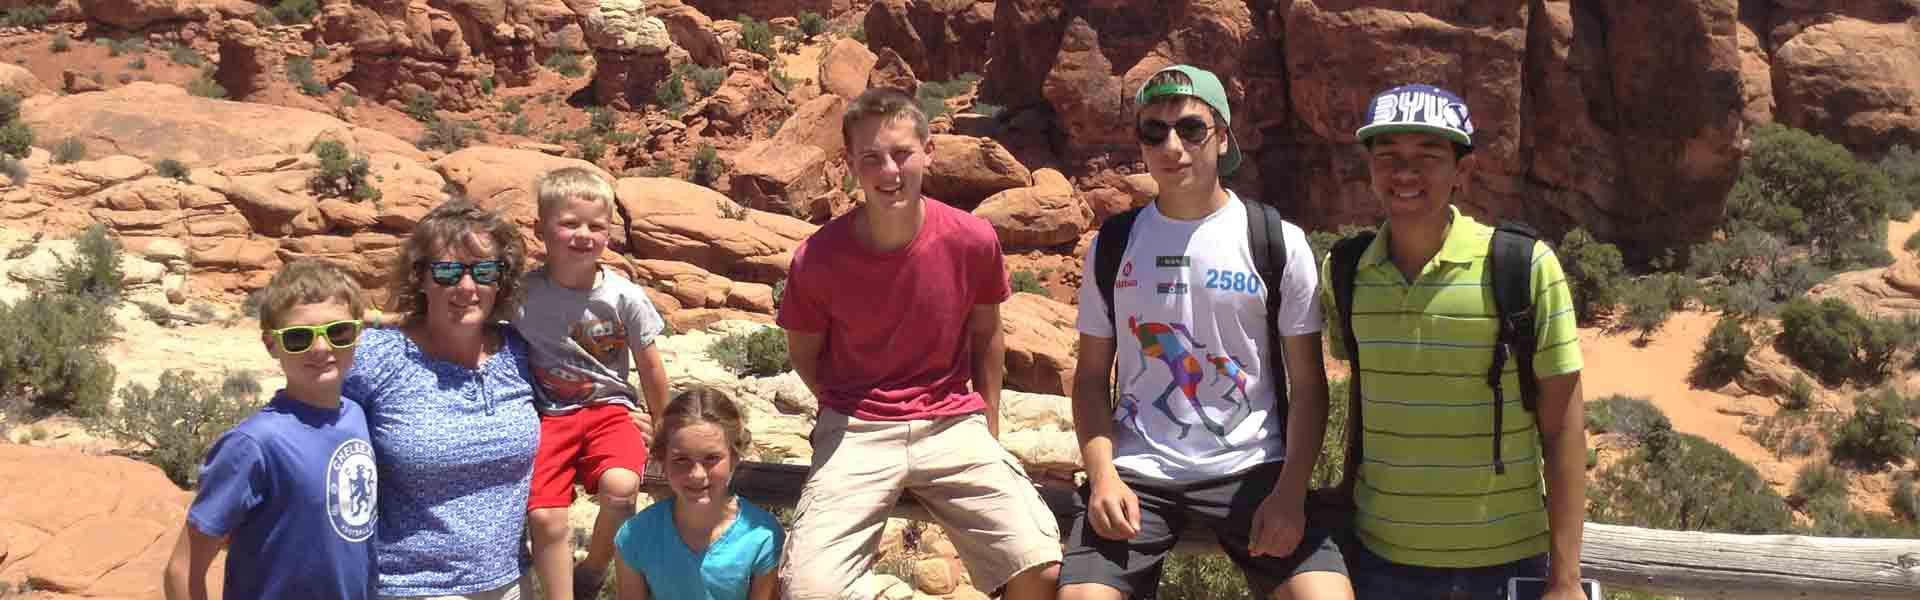 ScottsdaleUnified-Highschool-AZ-Rocks-MAin-Banner